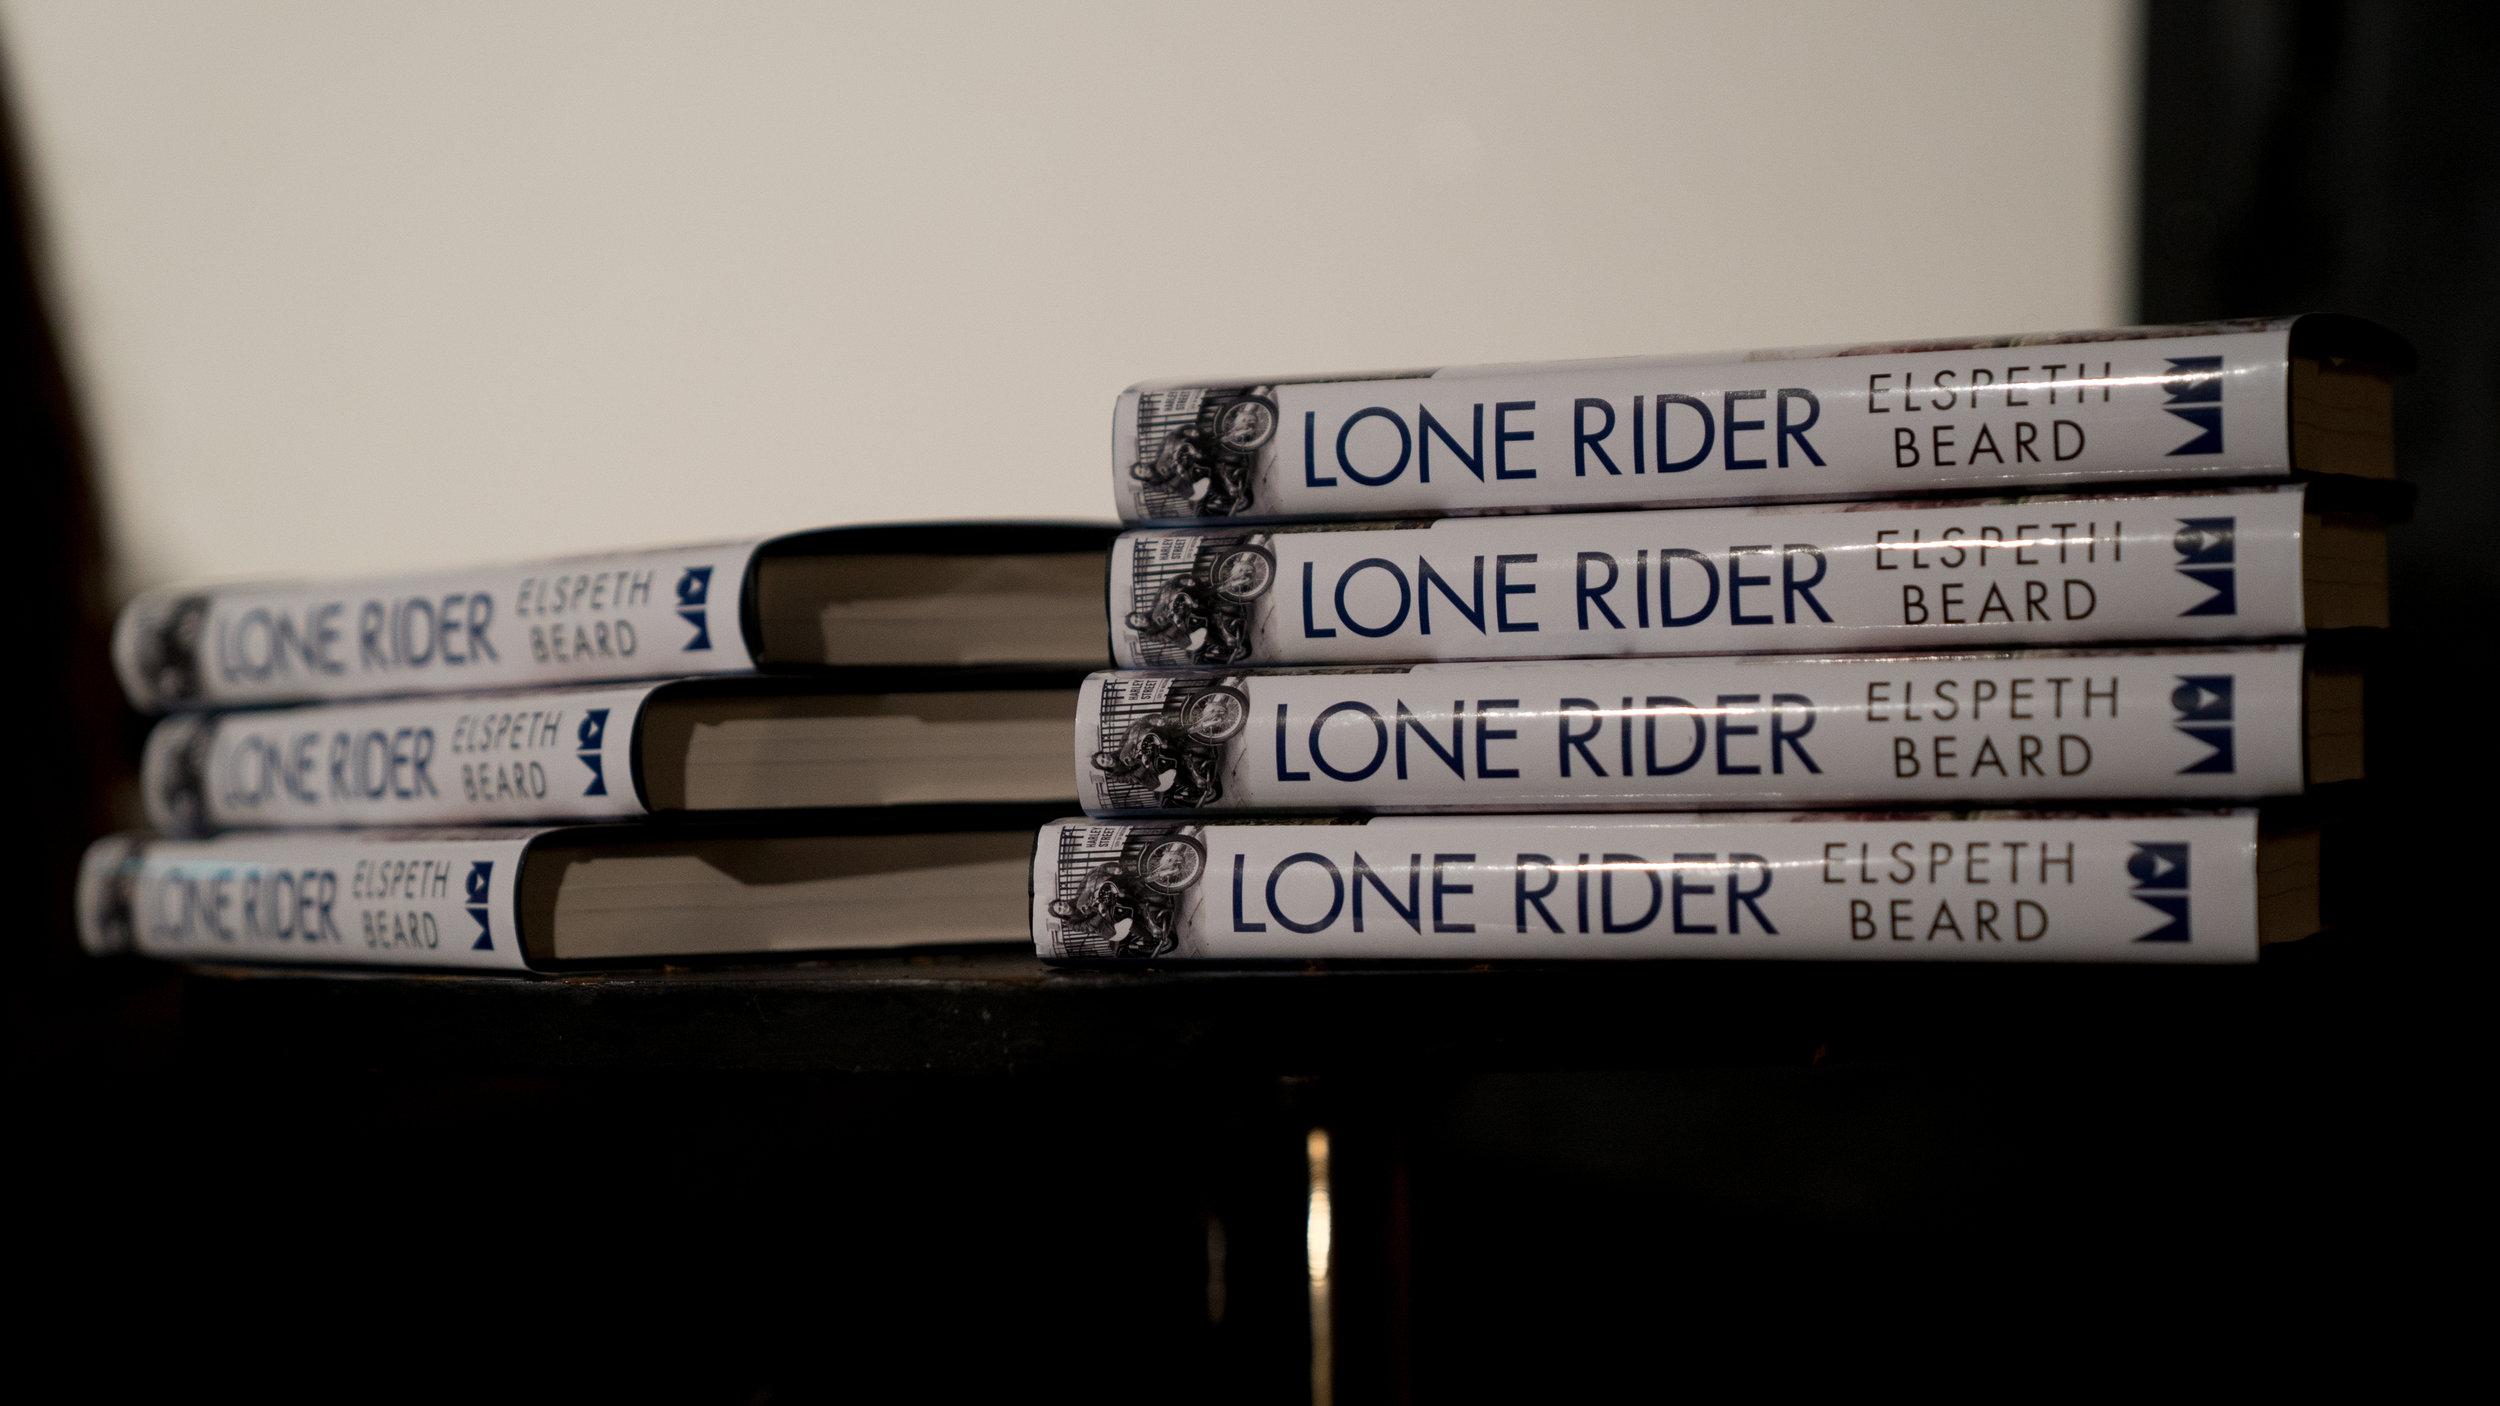 ELSPETH BEARD - 'LONE RIDER'